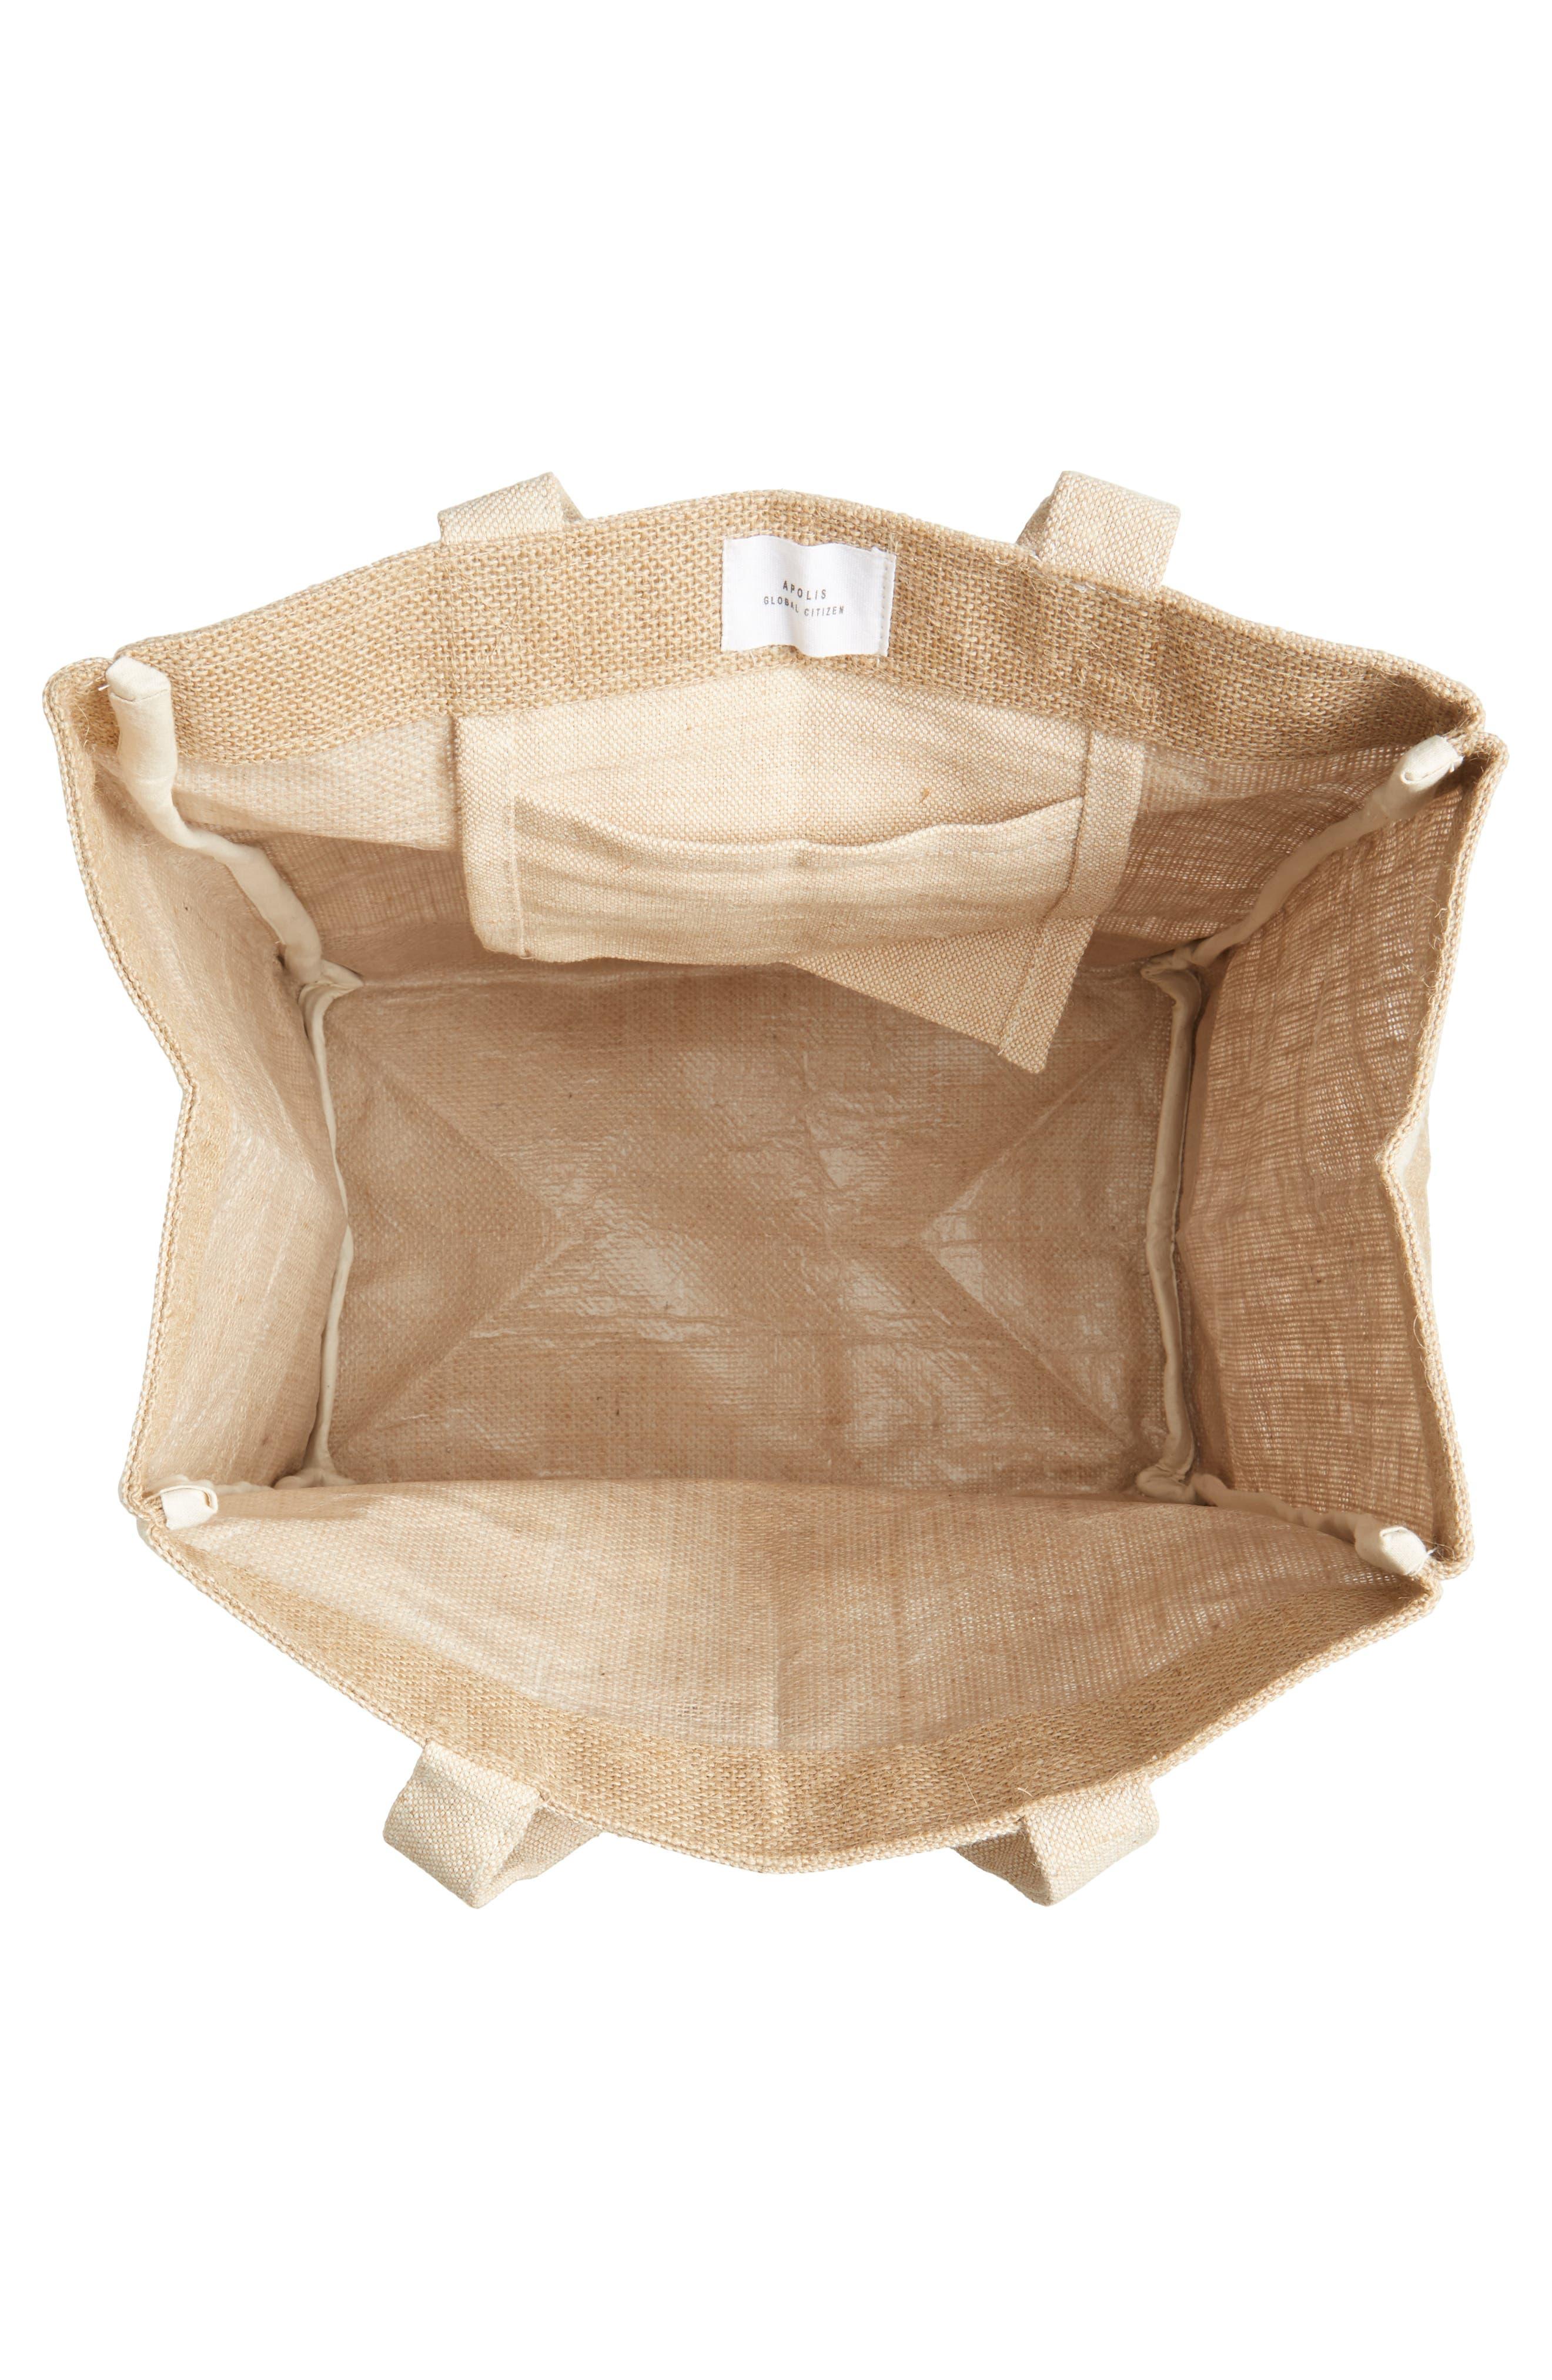 Alternate Image 3  - Apolis San Diego Simple Market Bag